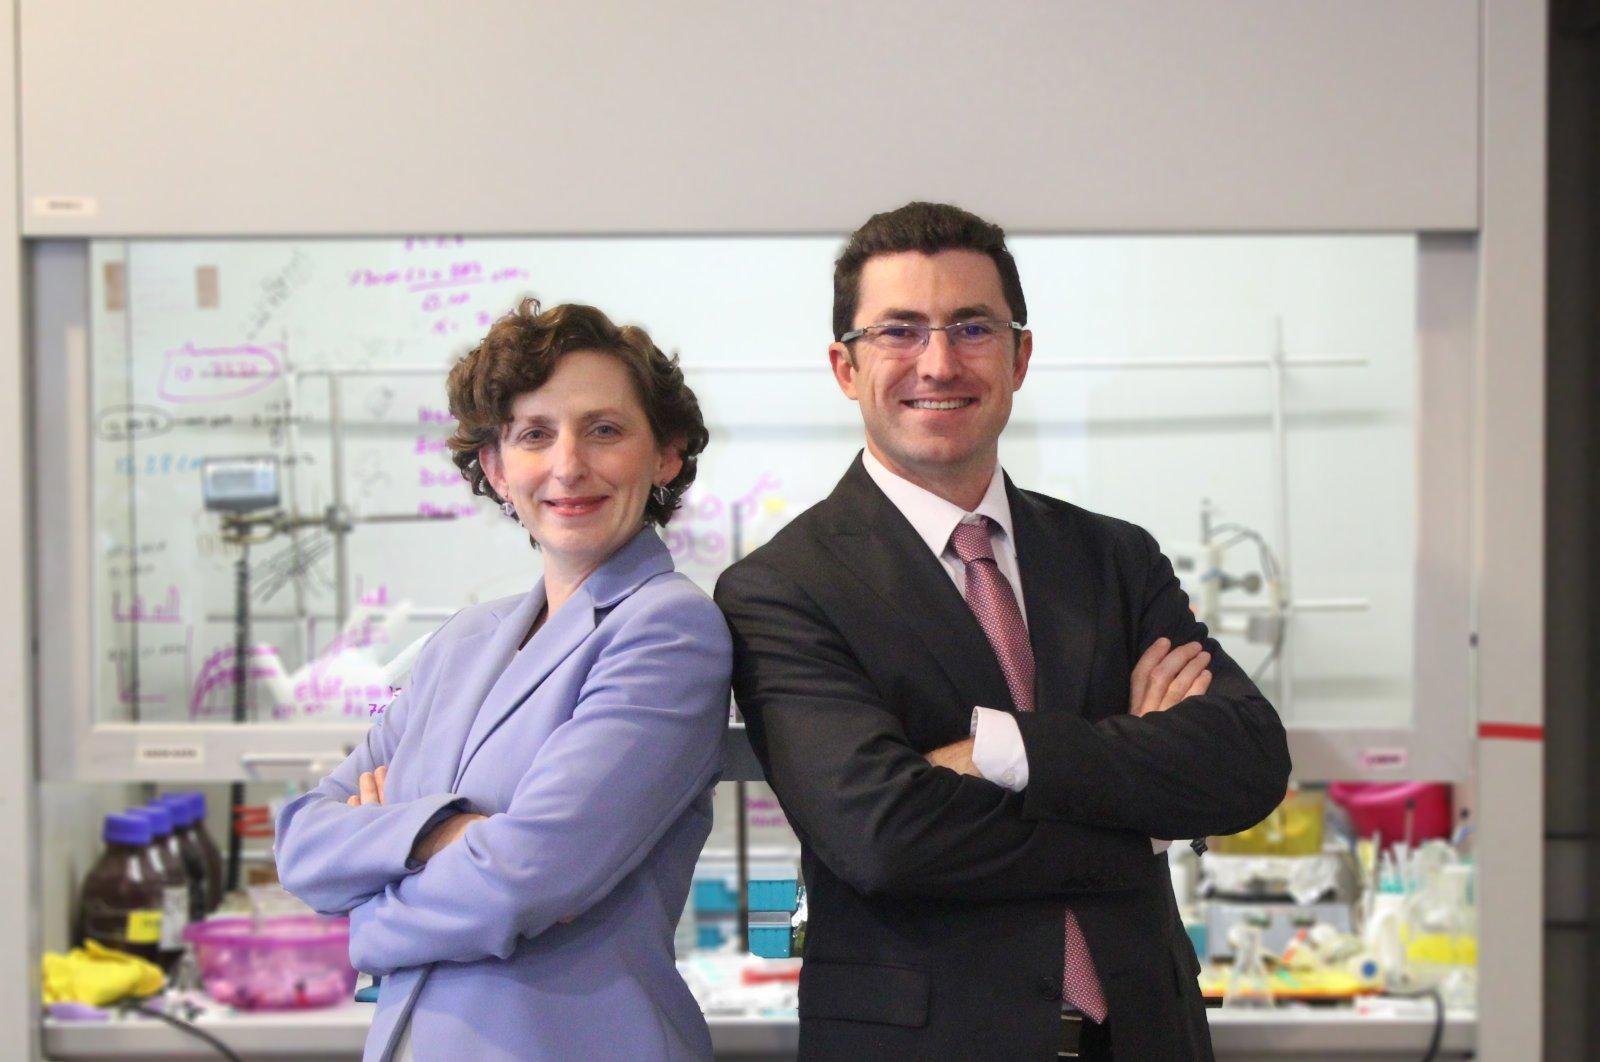 Sena Nomak (R) and Rana Sanyal, founders of RS Research, a next-generation therapeutics company developing novel nanomedicines.